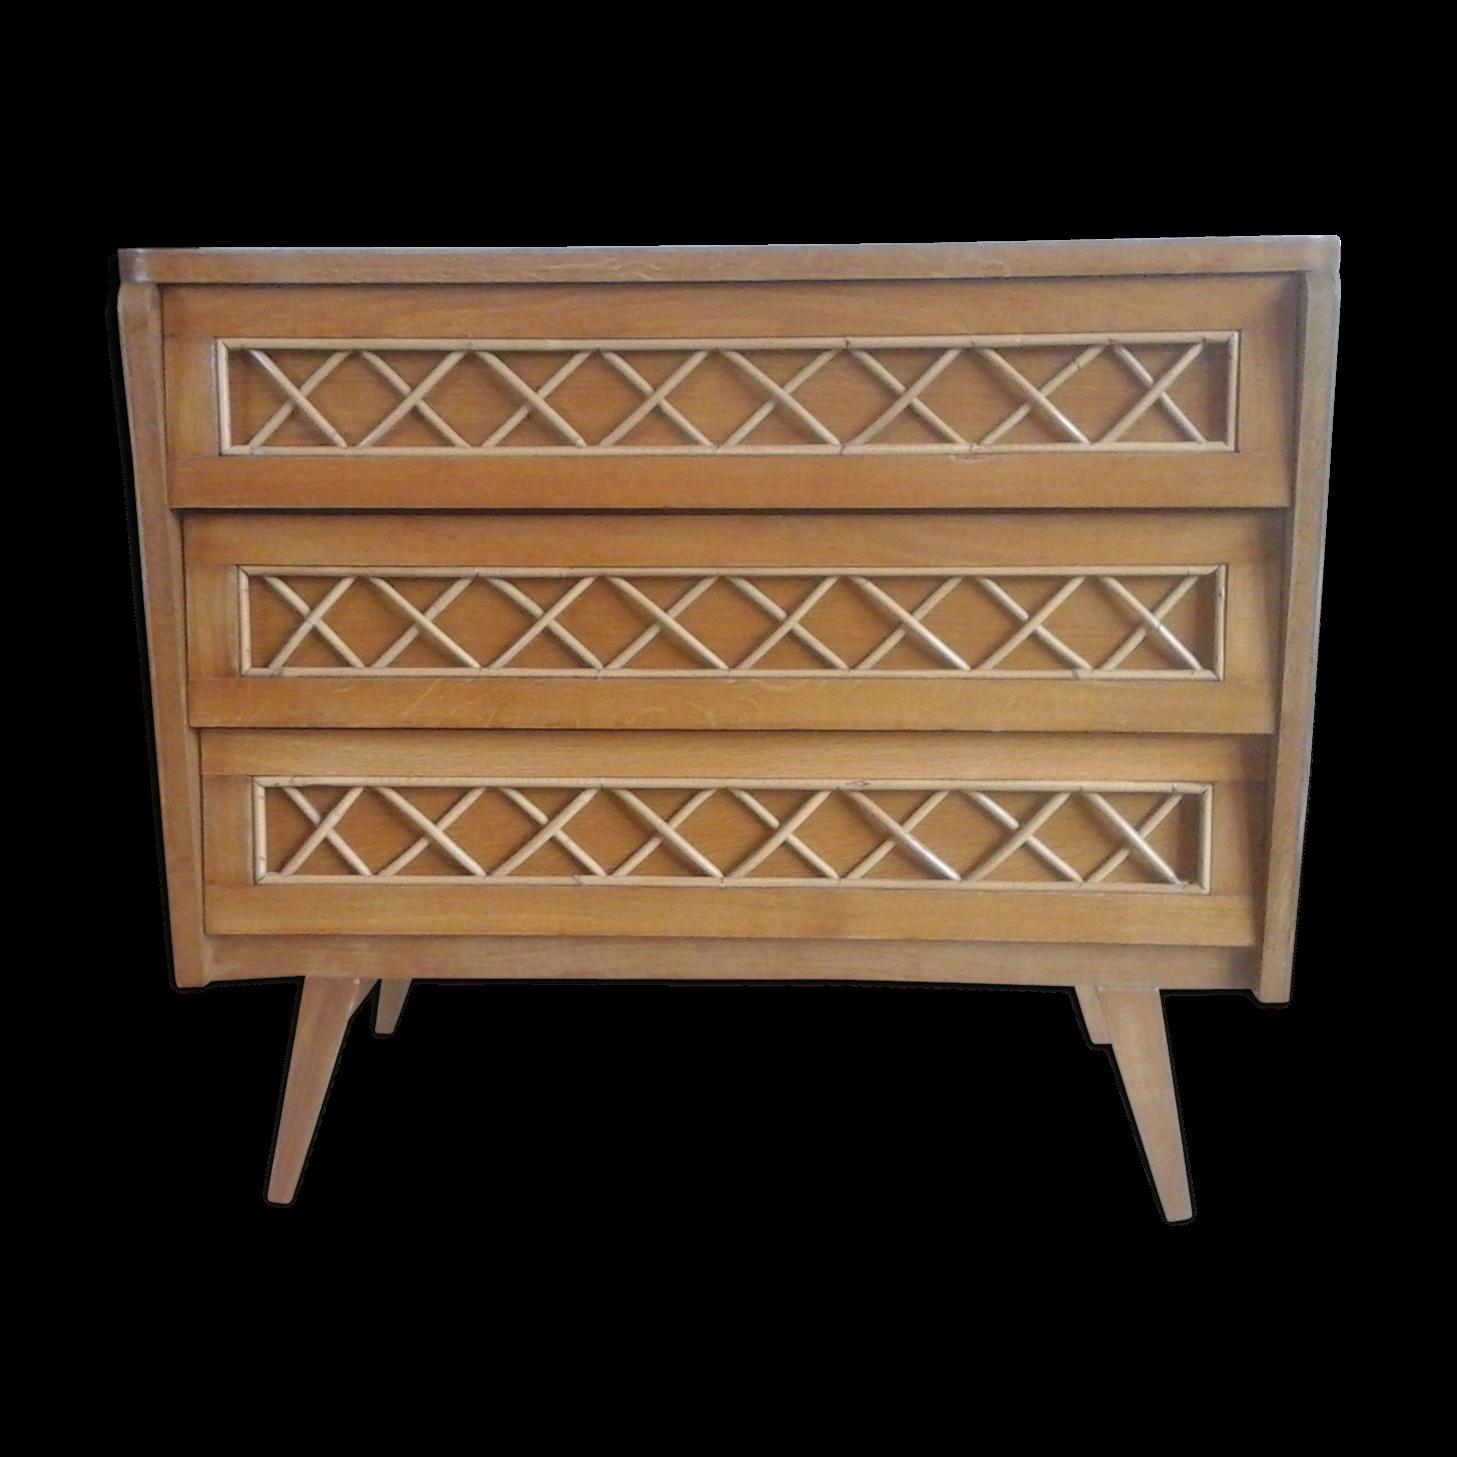 commode originale excellent petite commode galbe de style. Black Bedroom Furniture Sets. Home Design Ideas